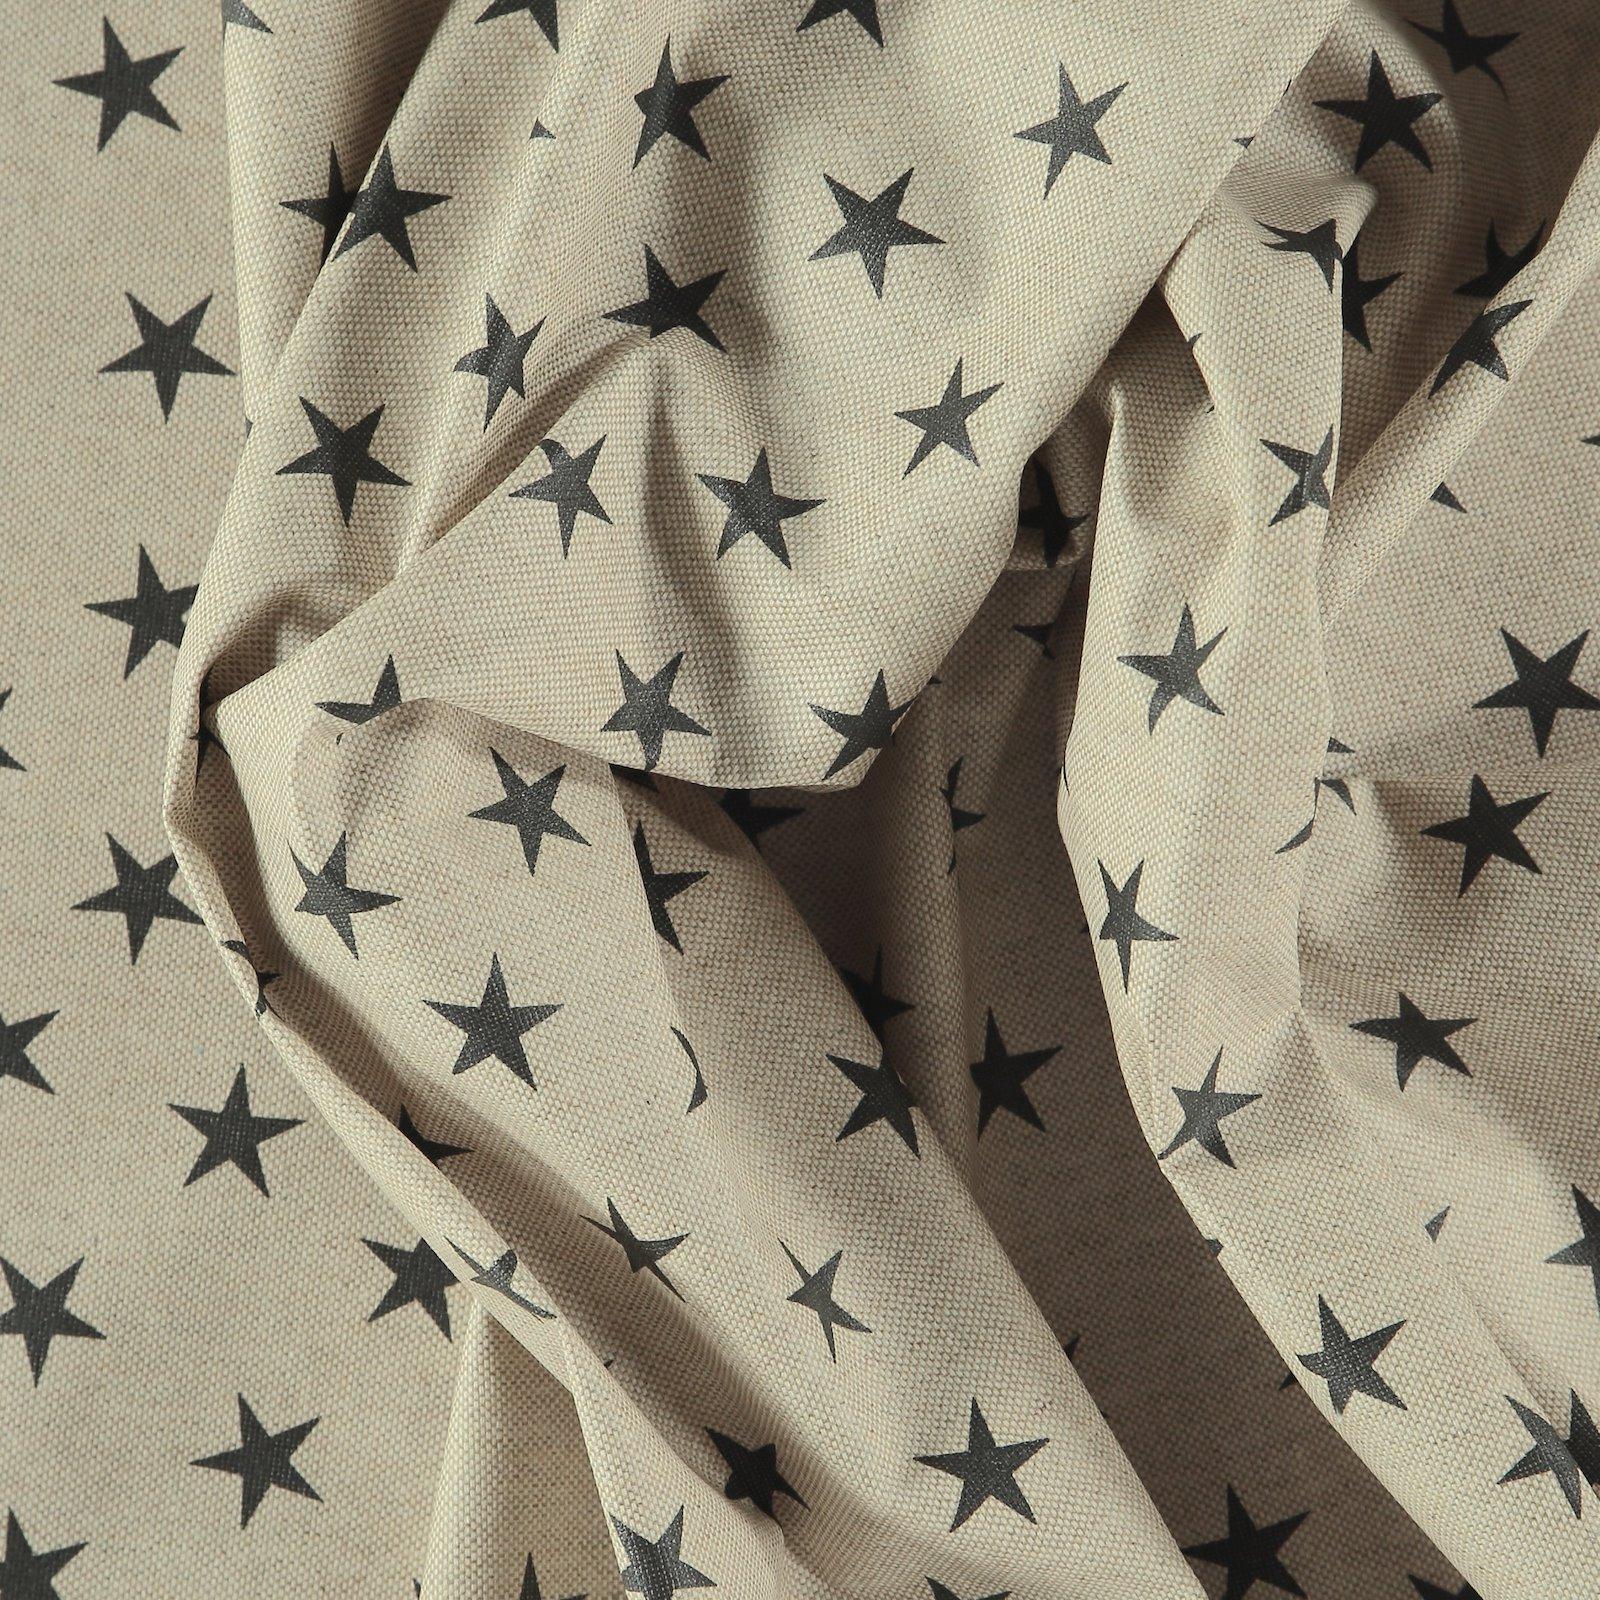 Woven oilcloth linenlook w black stars